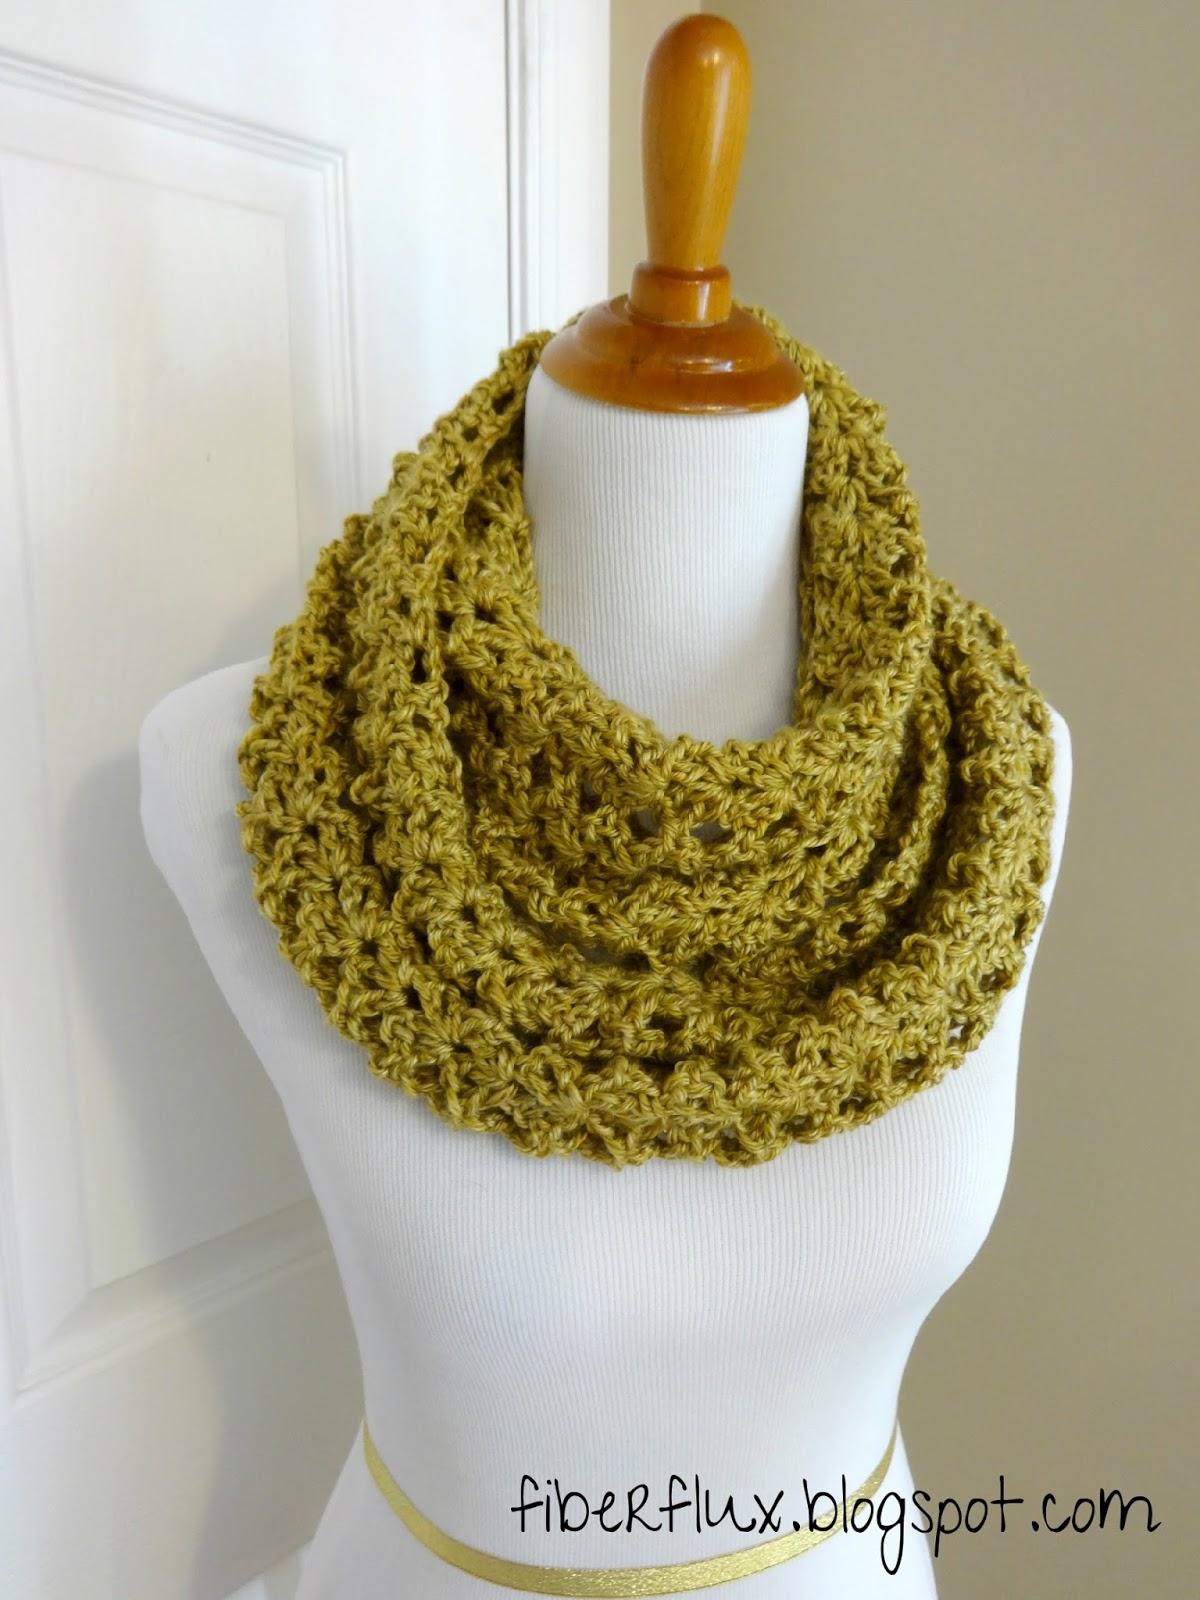 Fiber flux free crochet patterngold leaf infinity scarf free crochet patterngold leaf infinity scarf bankloansurffo Choice Image